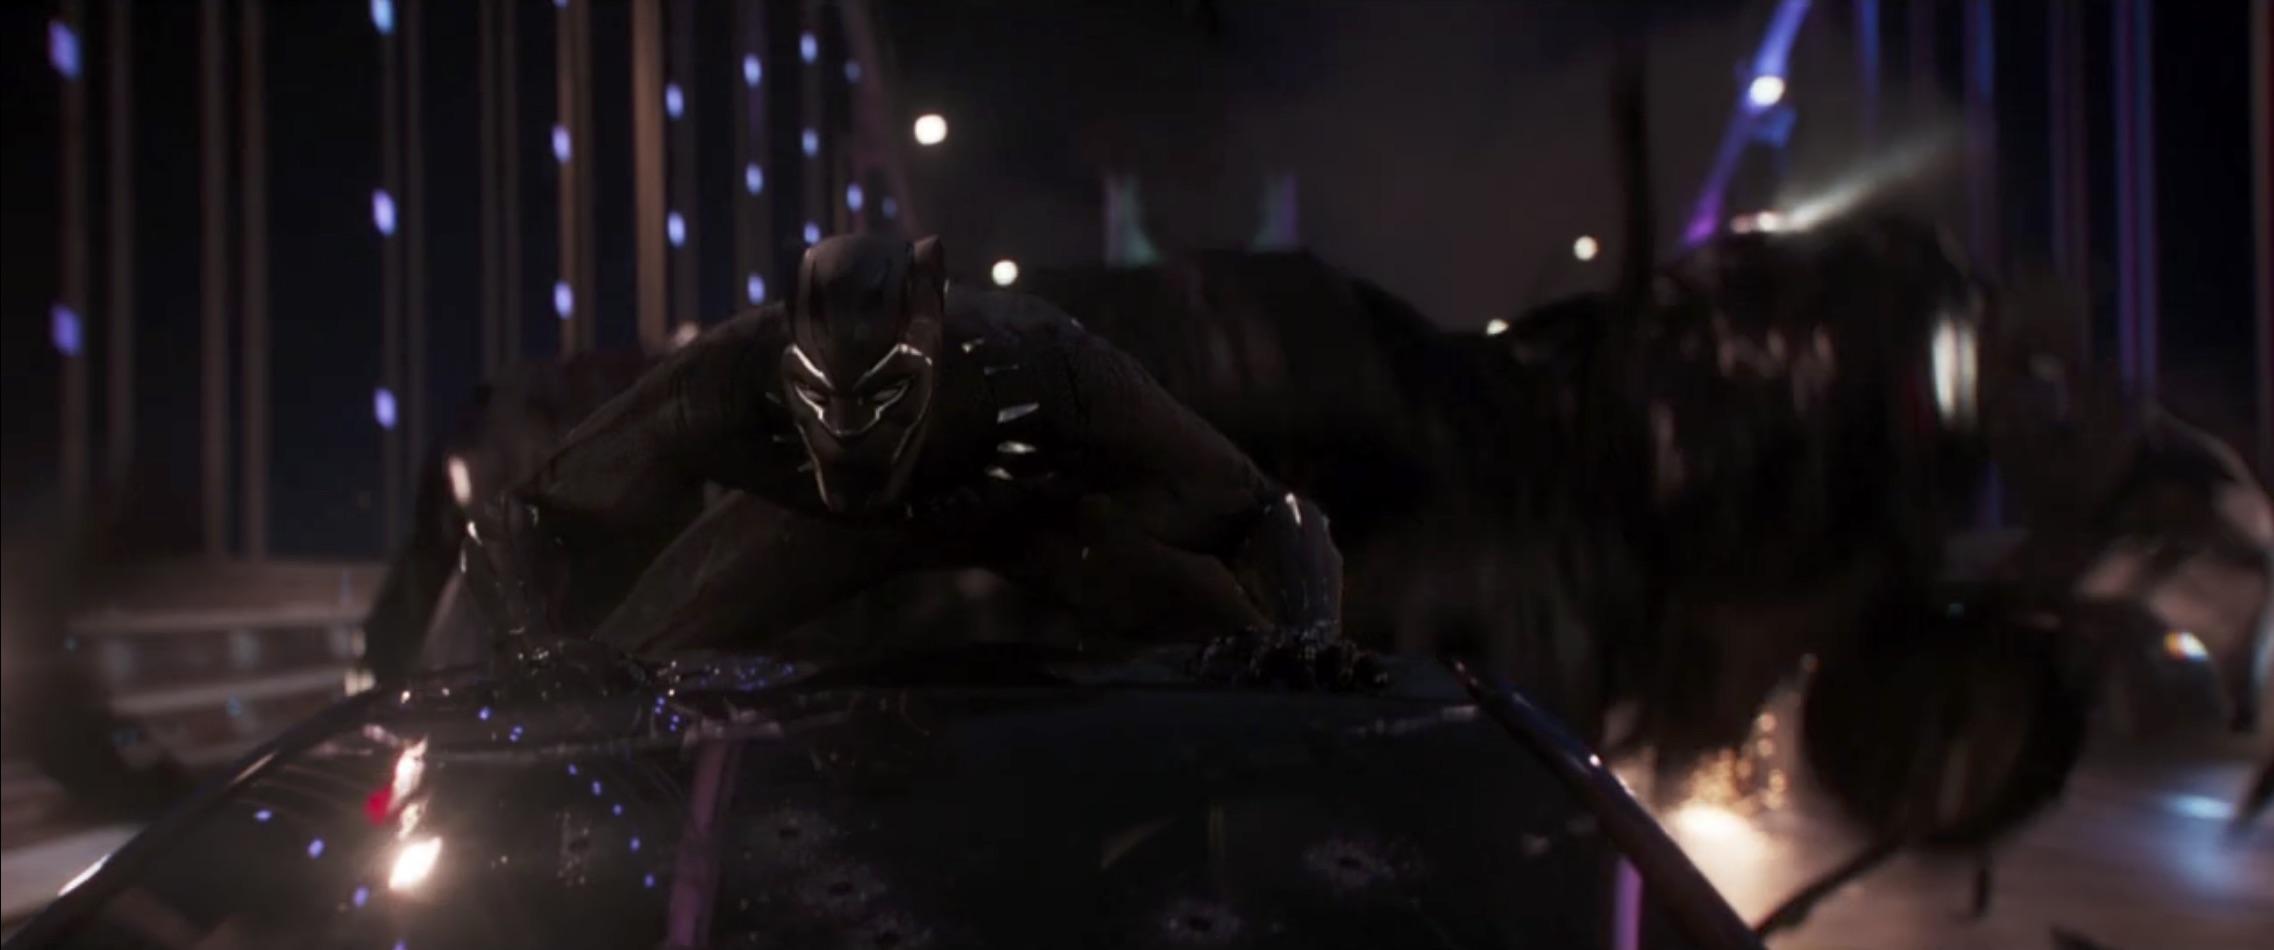 Marvel Black Panther hanging onto car